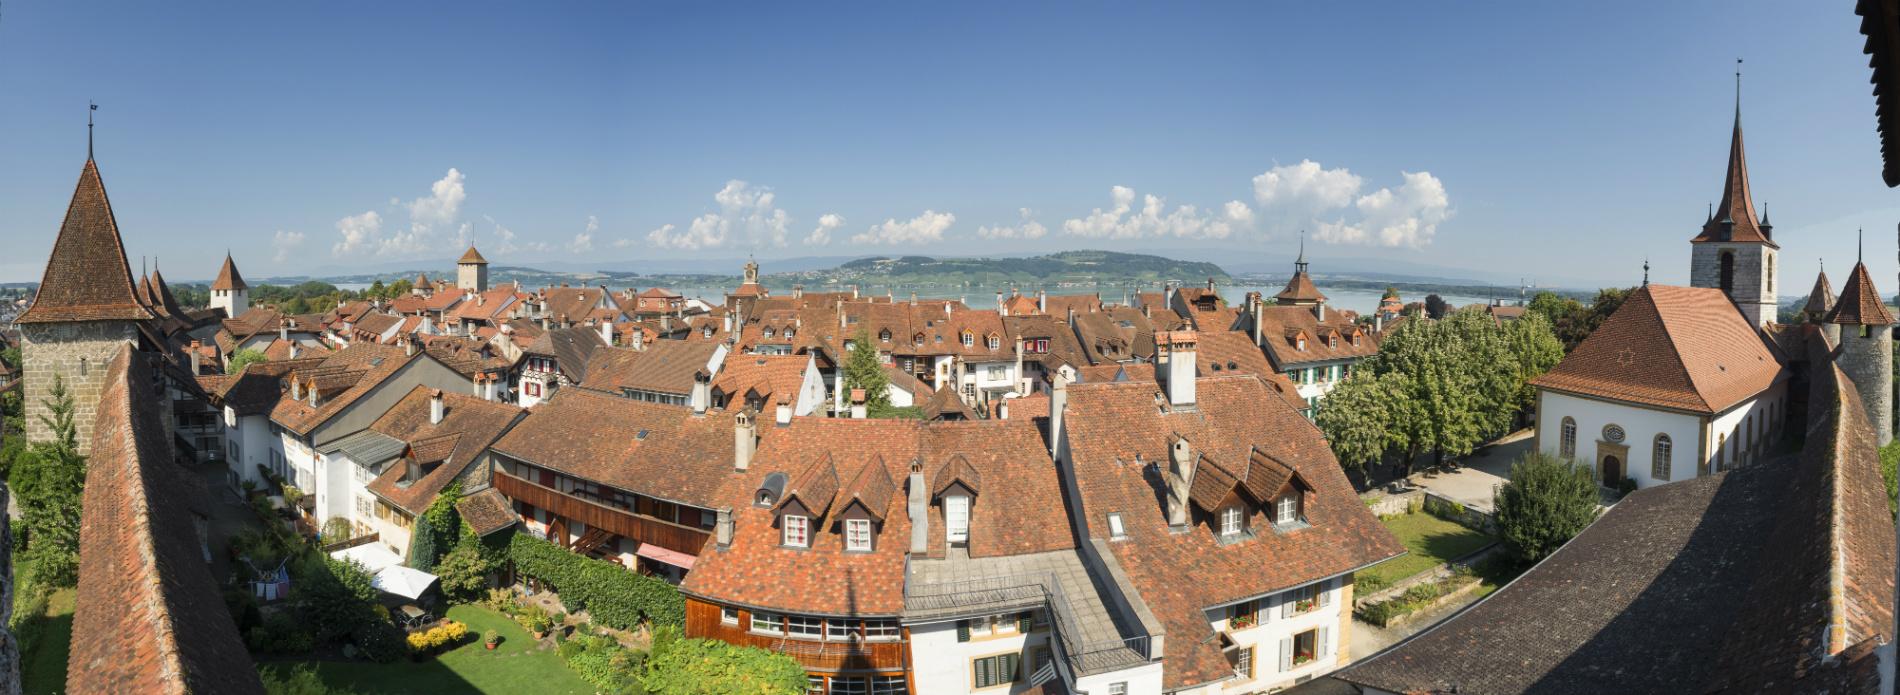 Murten, vista panoramica dalle mura